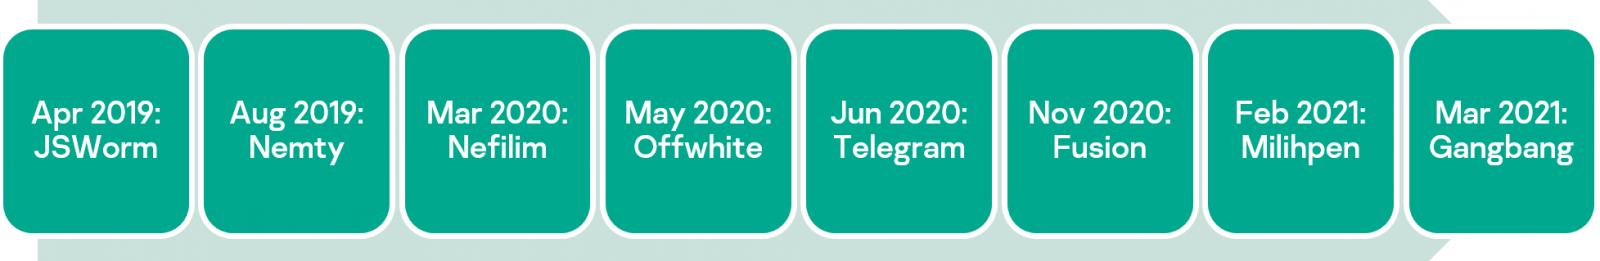 The evolution of JSWorm